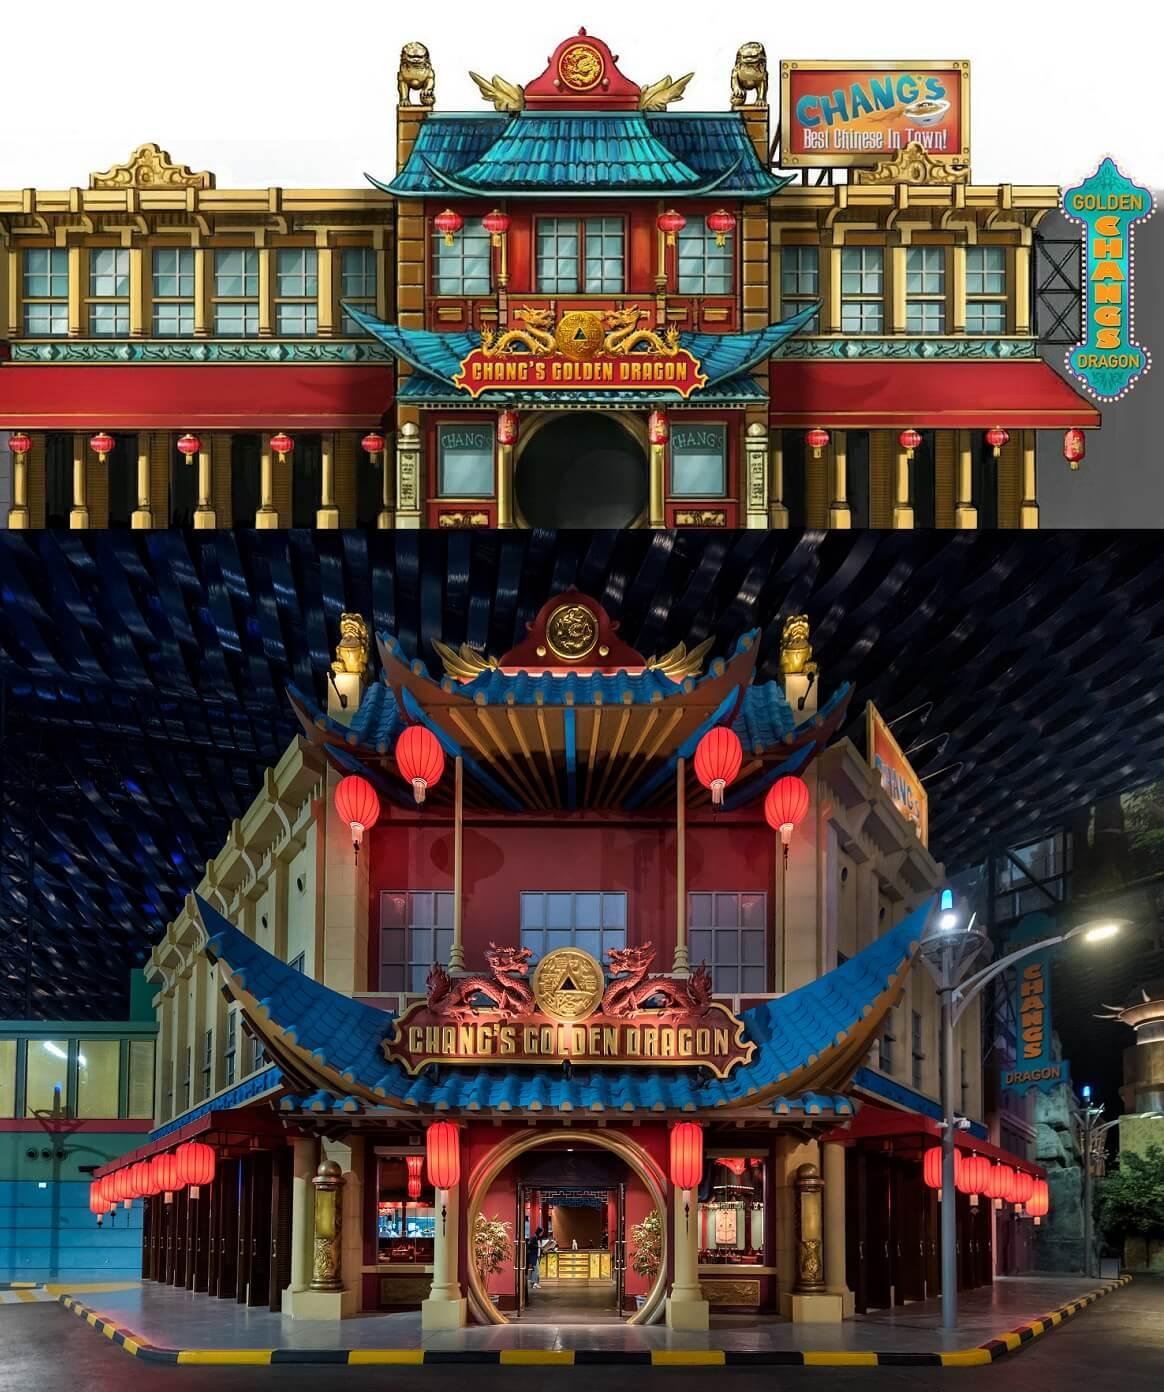 Changs-Golden-Dragon-Restaurant-Before-After